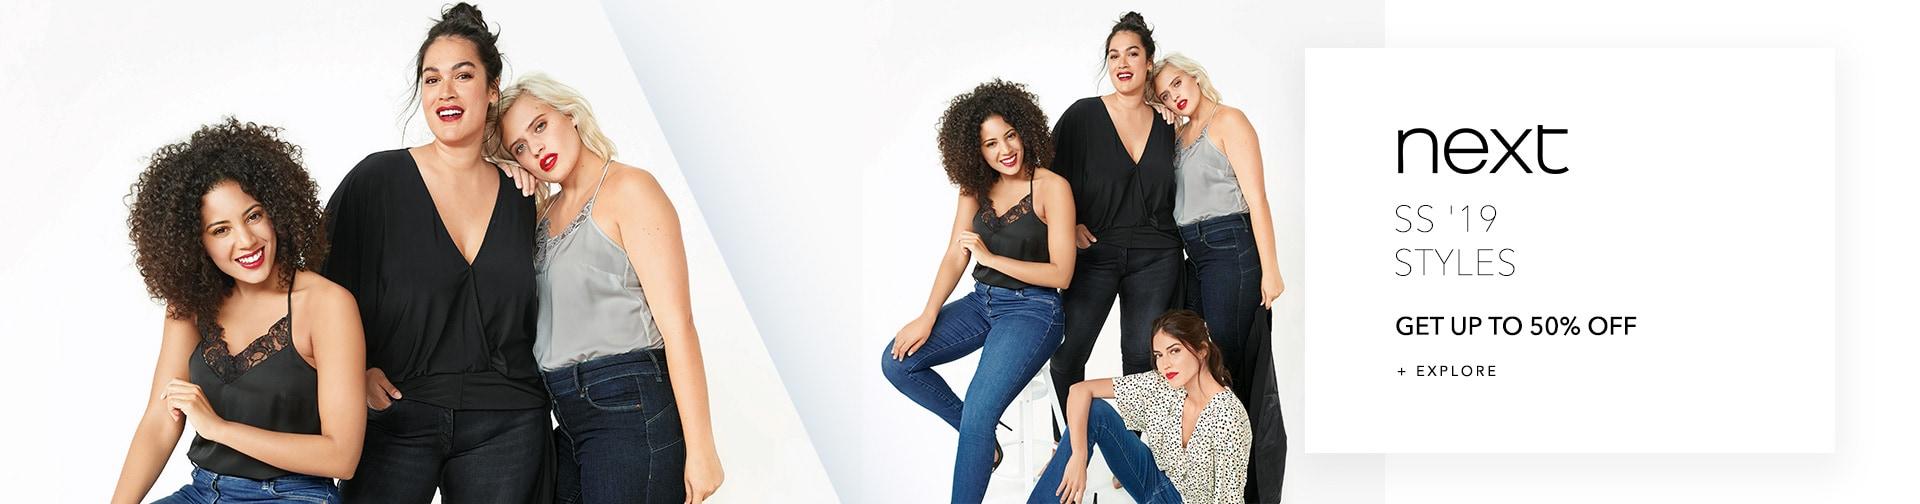 314ff0d11 Online Shopping for Women - Shop For Women Clothes